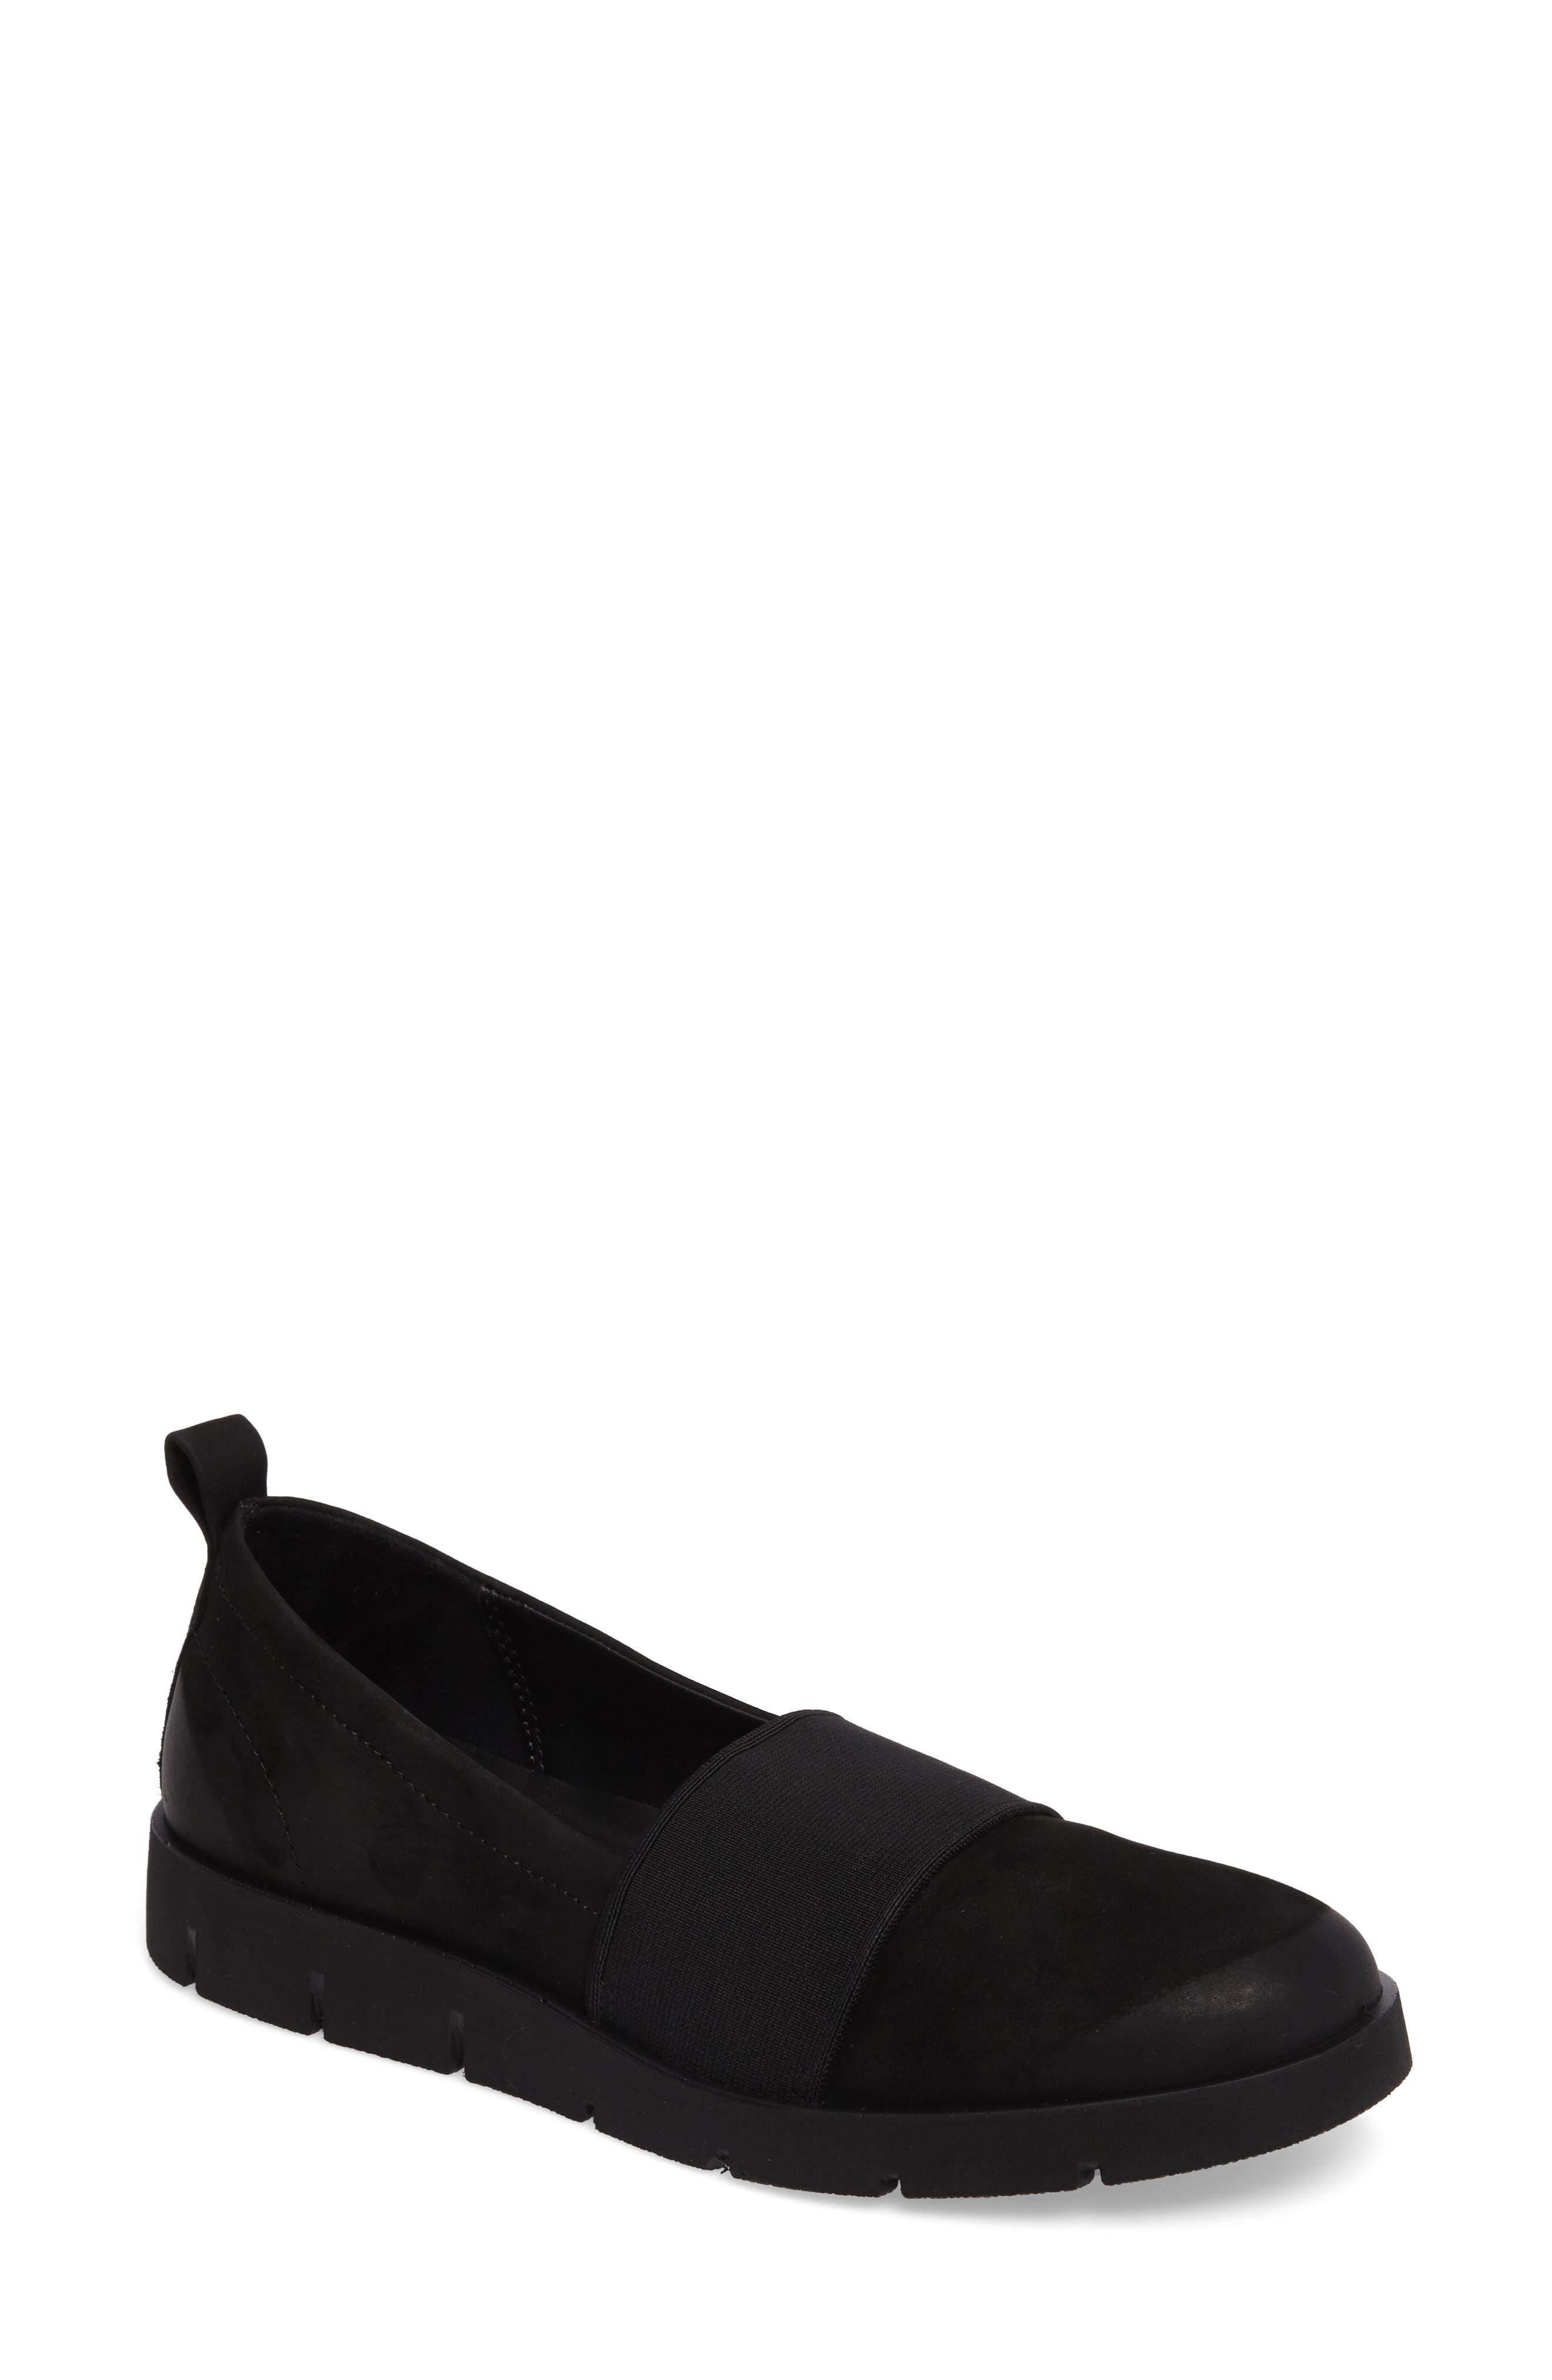 Alternate Image 1 Selected - ECCO Bella Slip-On Sneaker (Women)